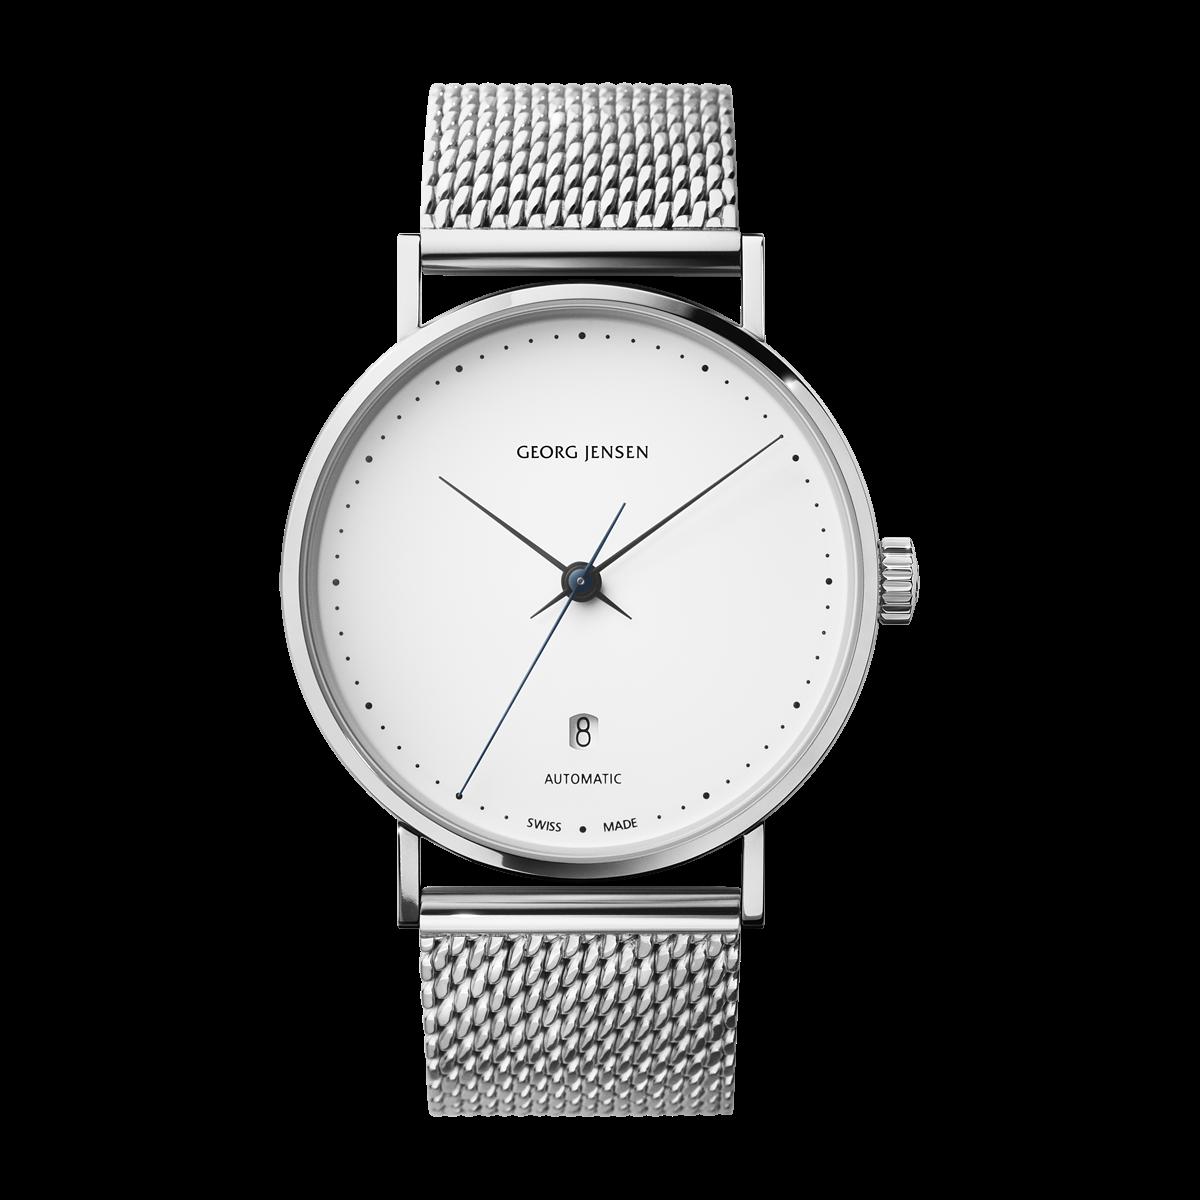 KOPPEL - 41 mm, Automatic mechanical, white dial, steel bracelet